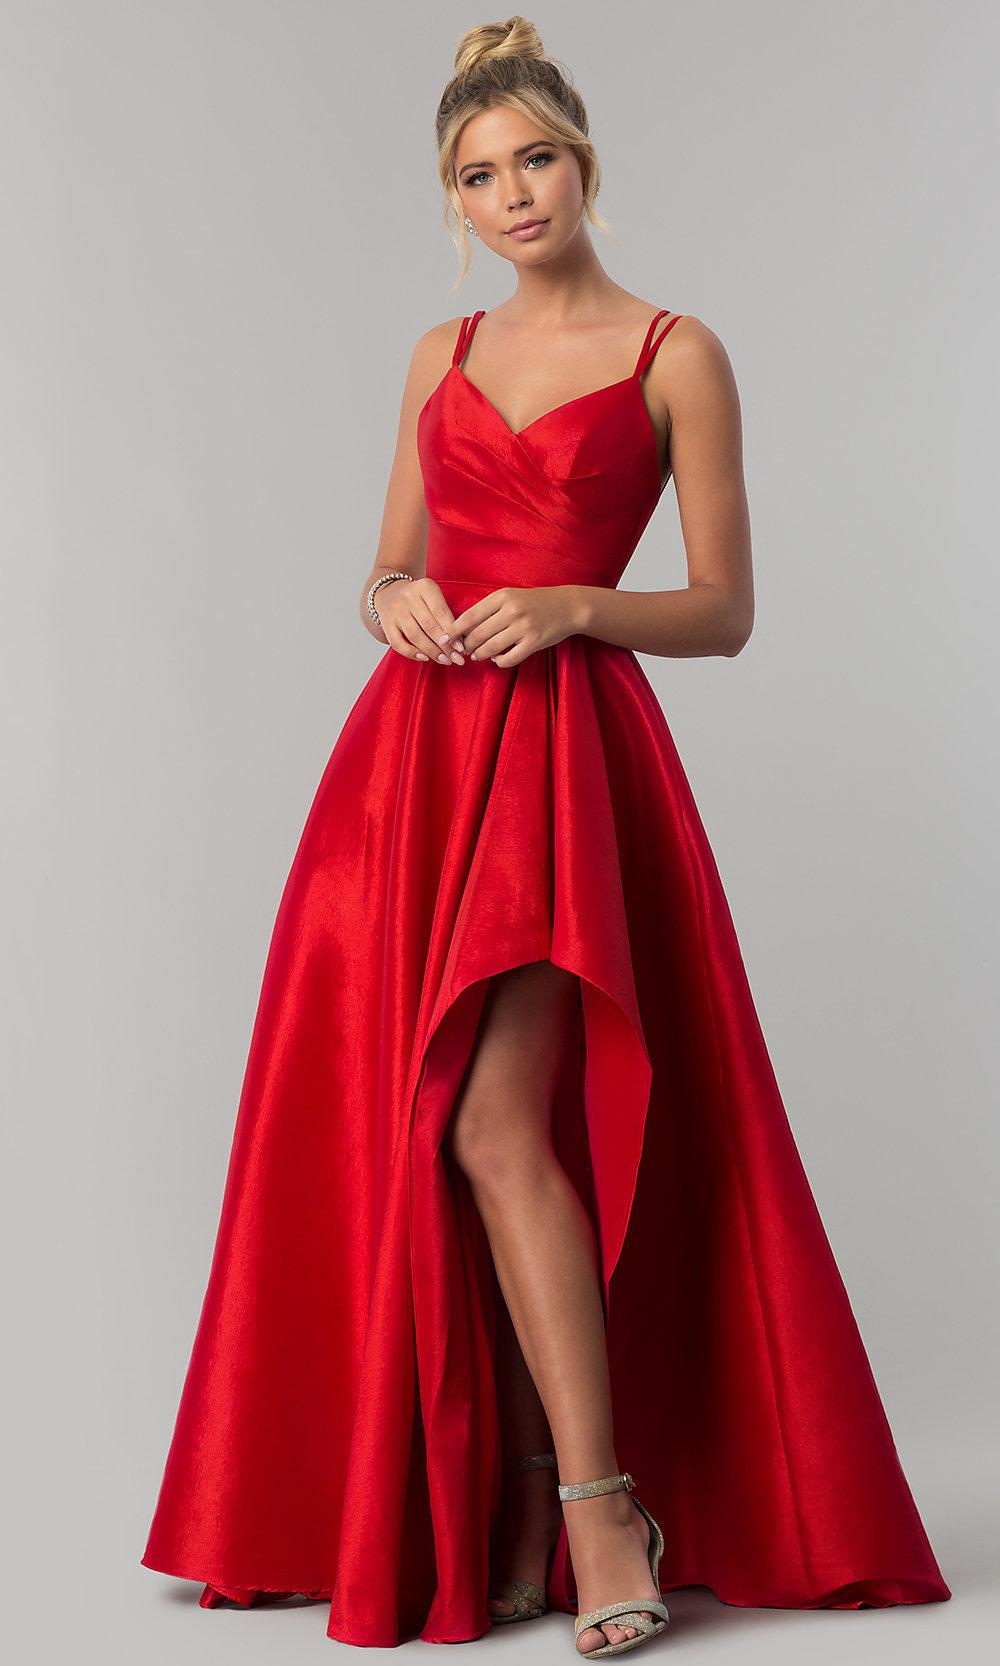 Stretch-taffeta high-low red prom dress